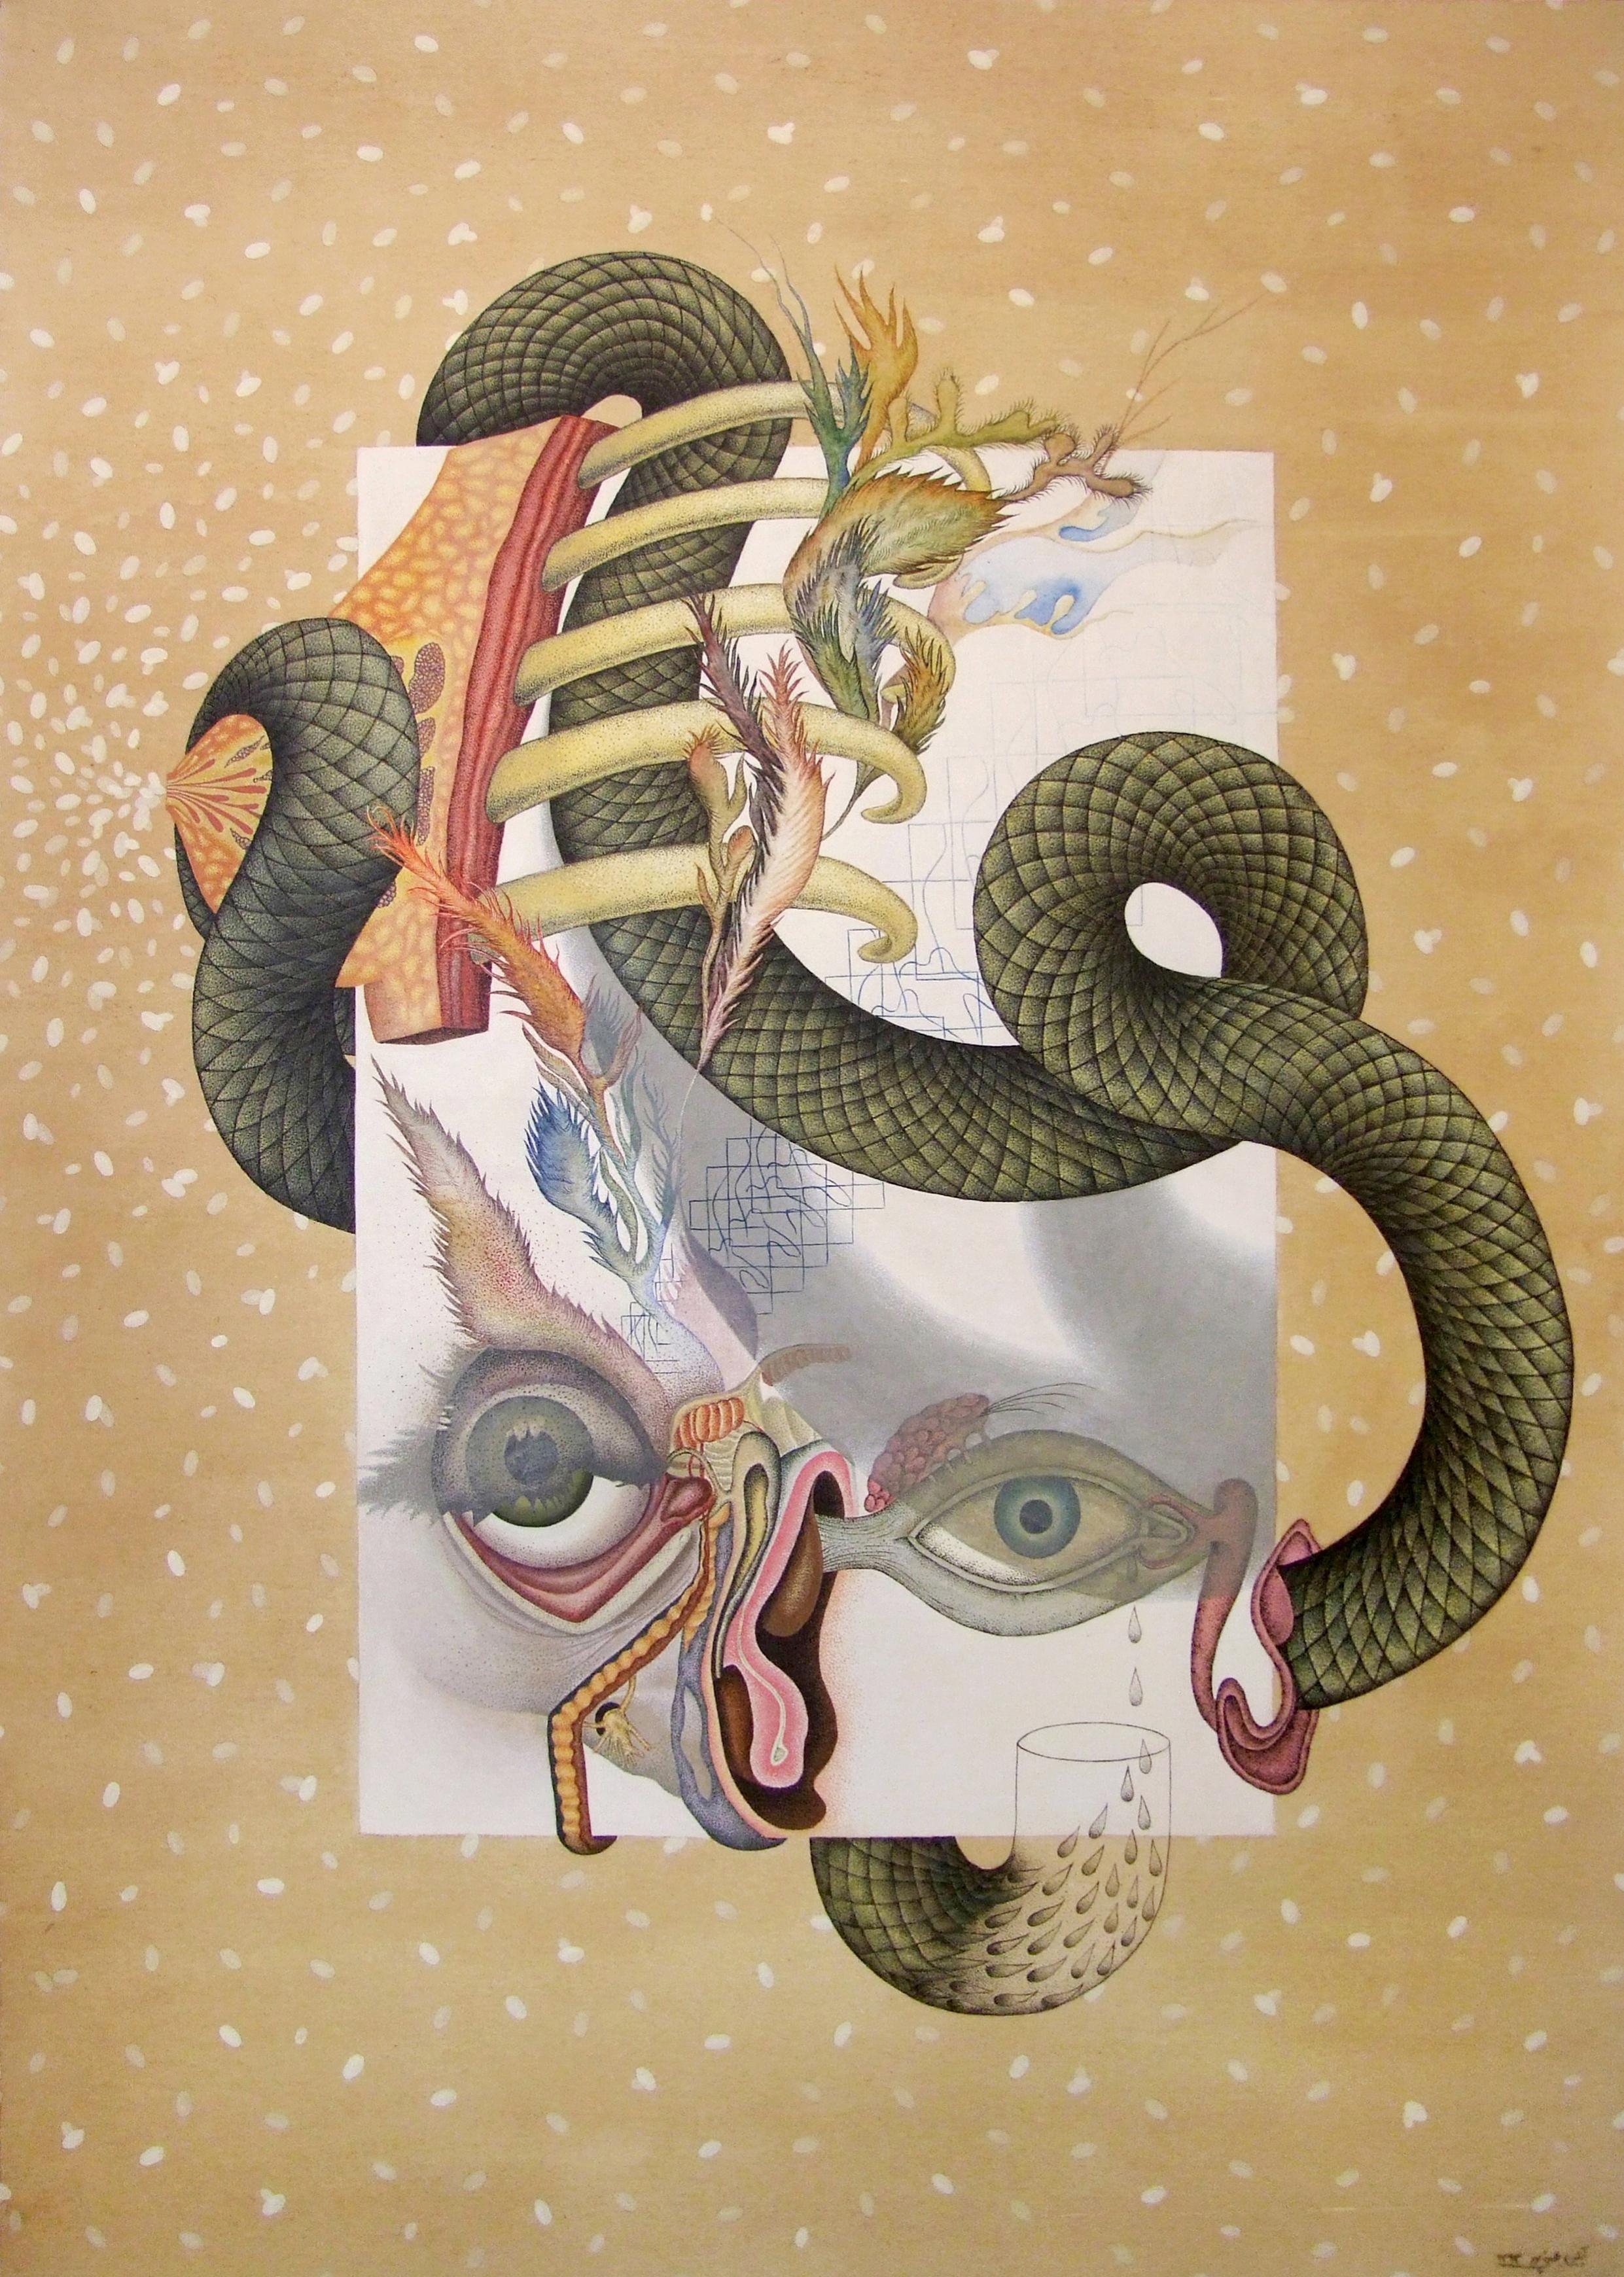 Sucking My Tears, 36x50 inch, acrylic, watercolour, and tea on canvas, 2014